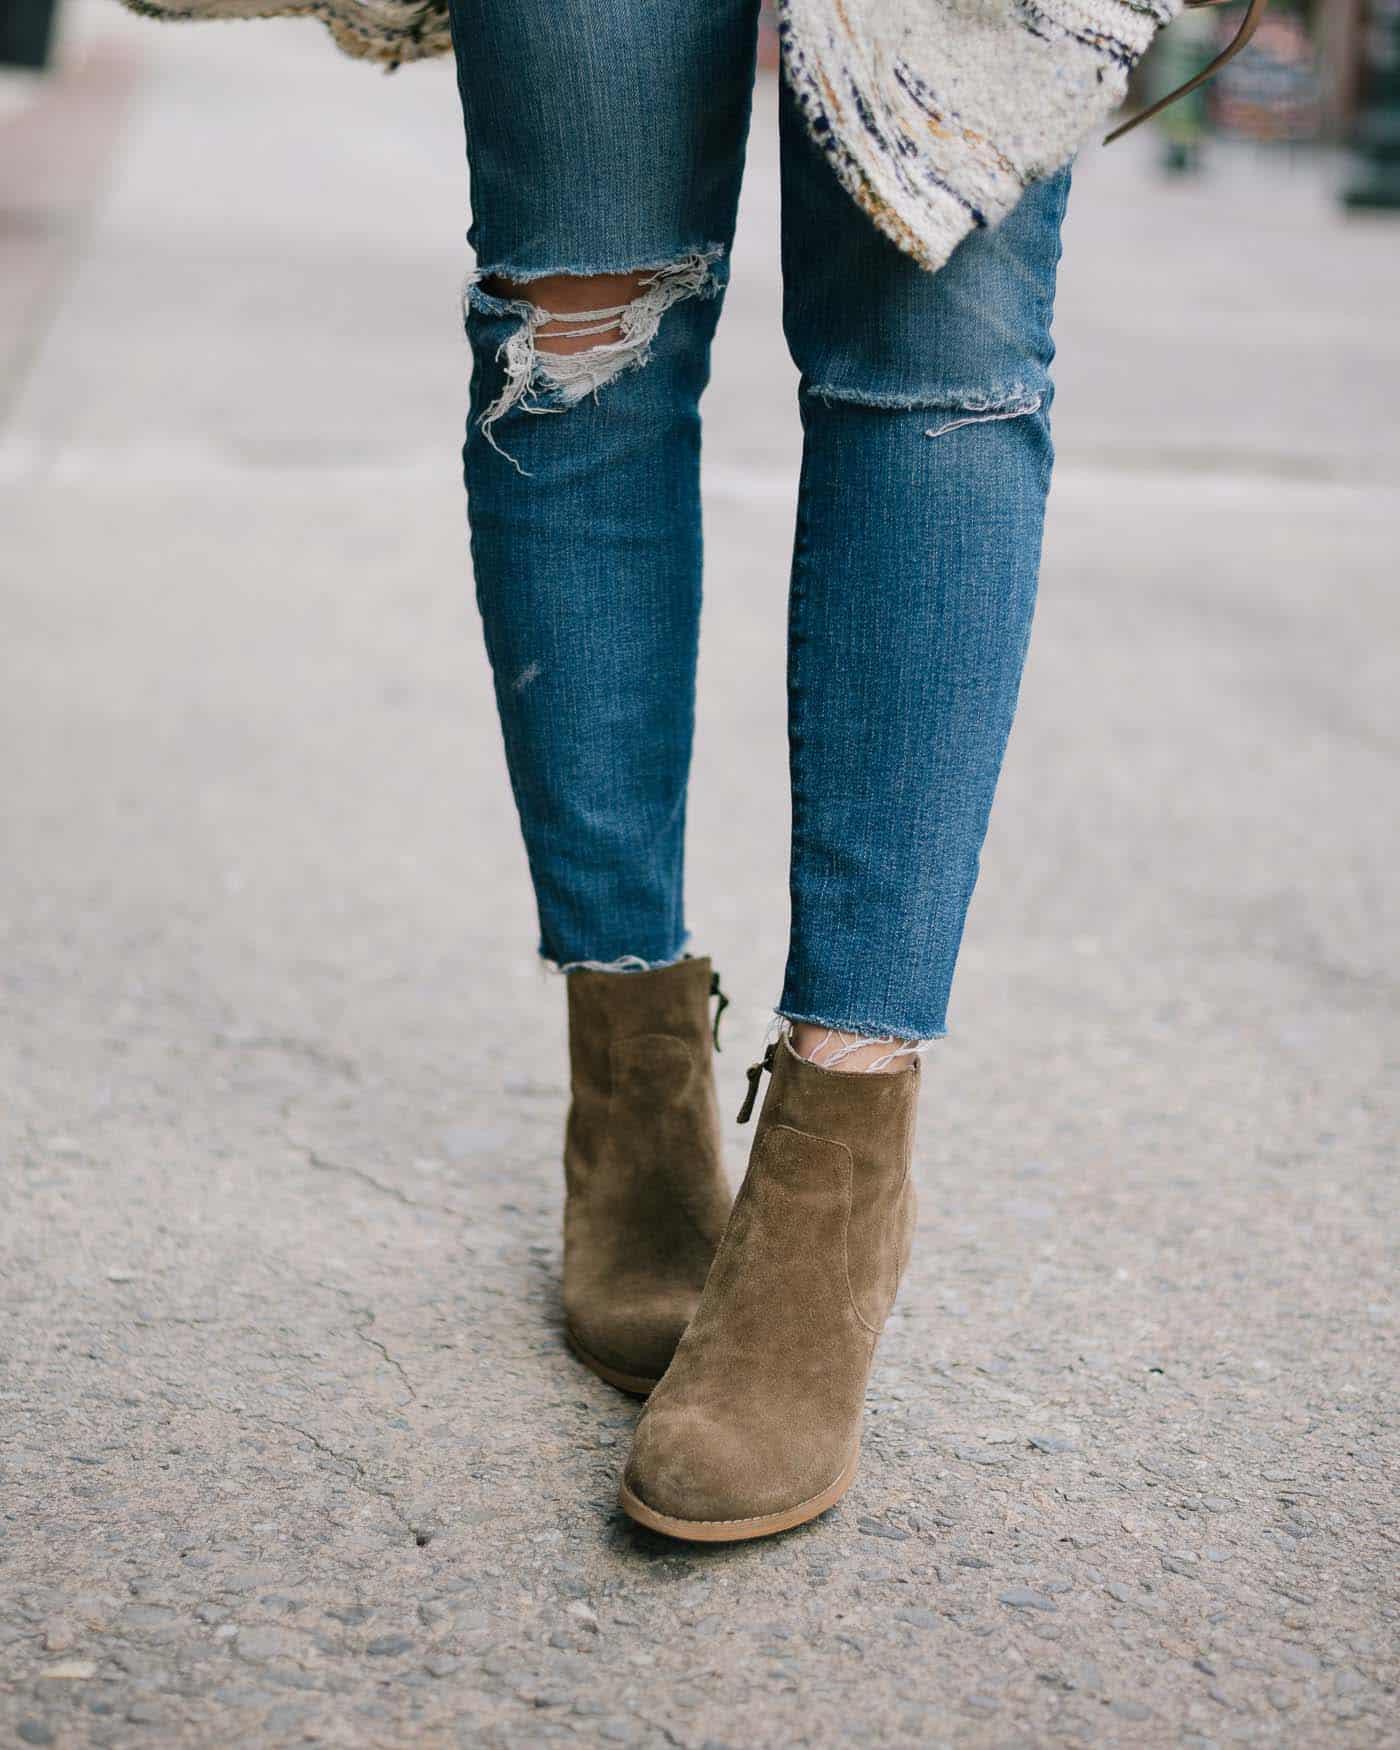 fall outfit, booties, fall boots, womens fashion - My Style Vita @mystylevita